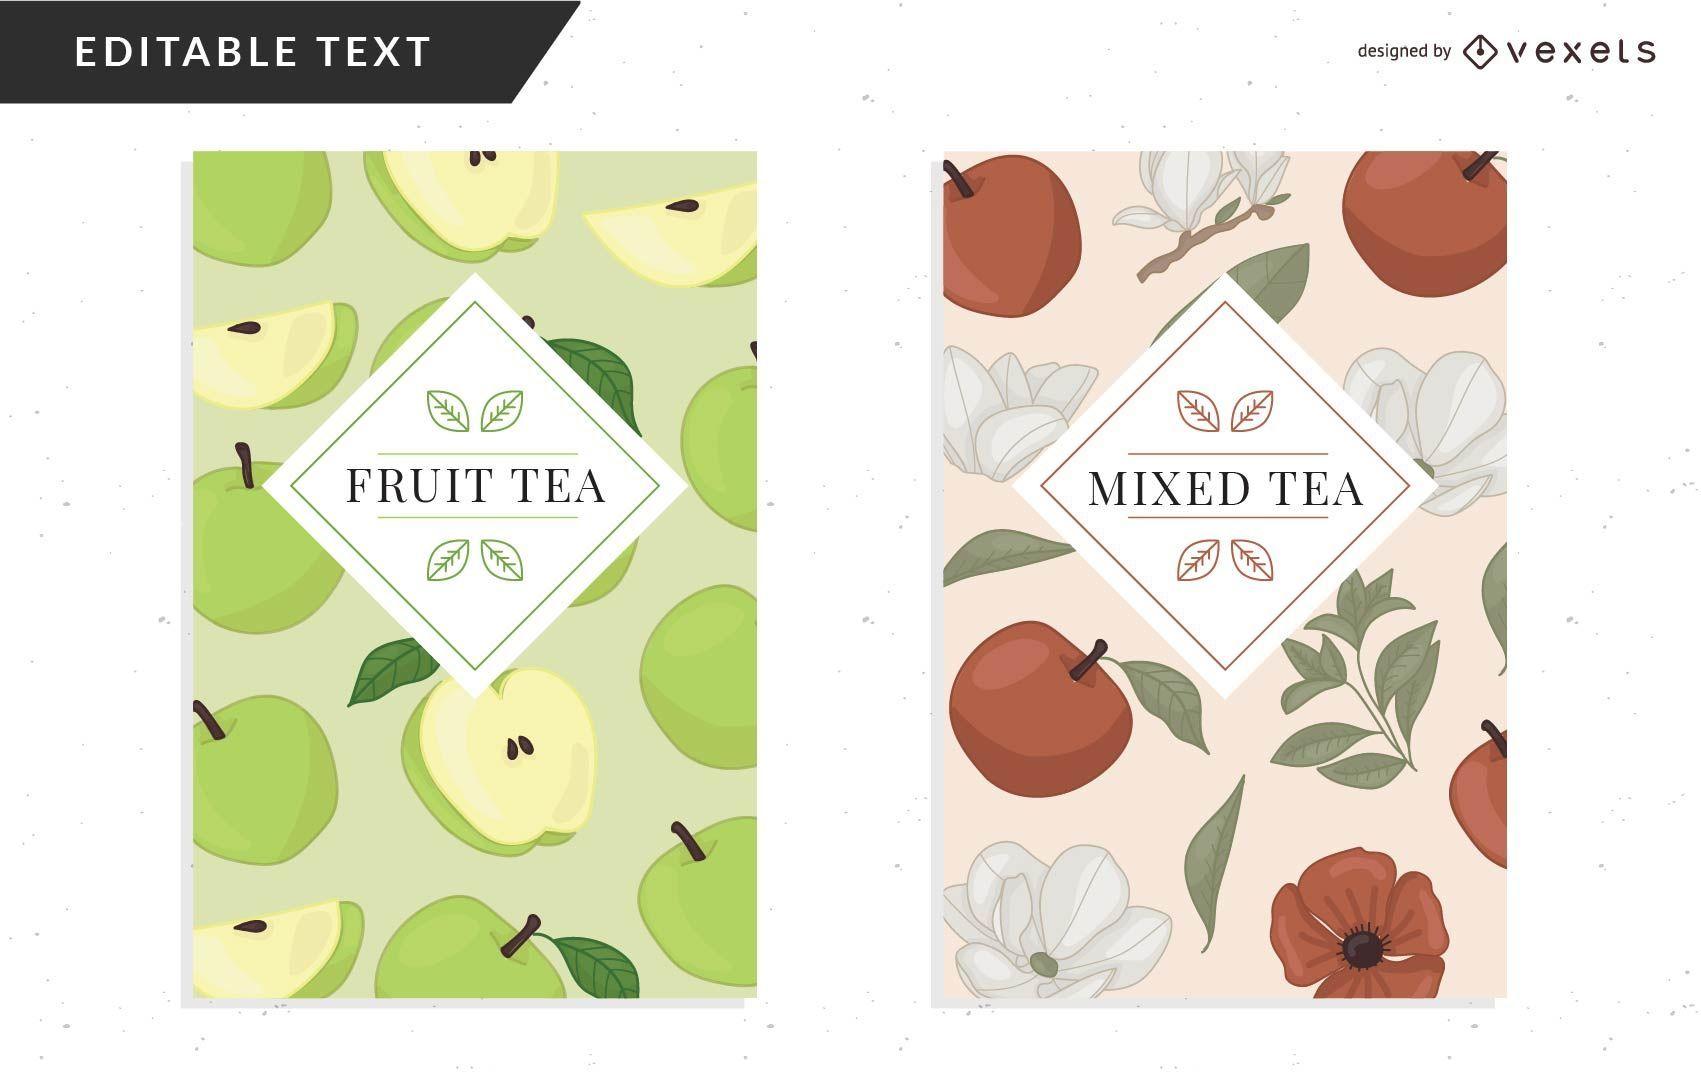 Tea Packaging Design Template